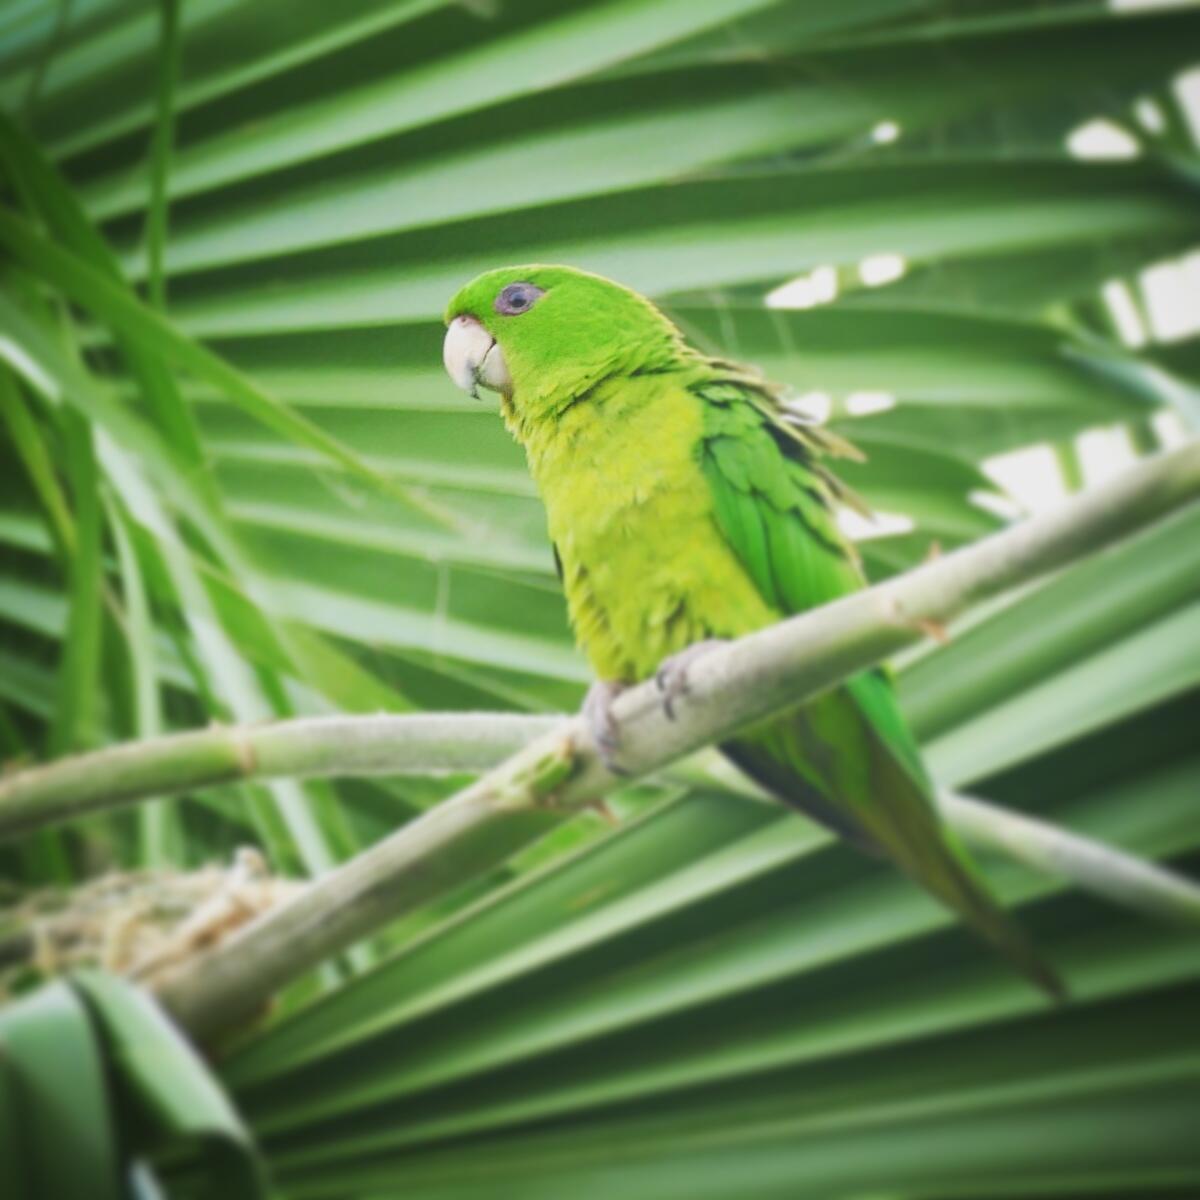 Noah's view of a Green Parakeet in Weslaco. Noah Strycker